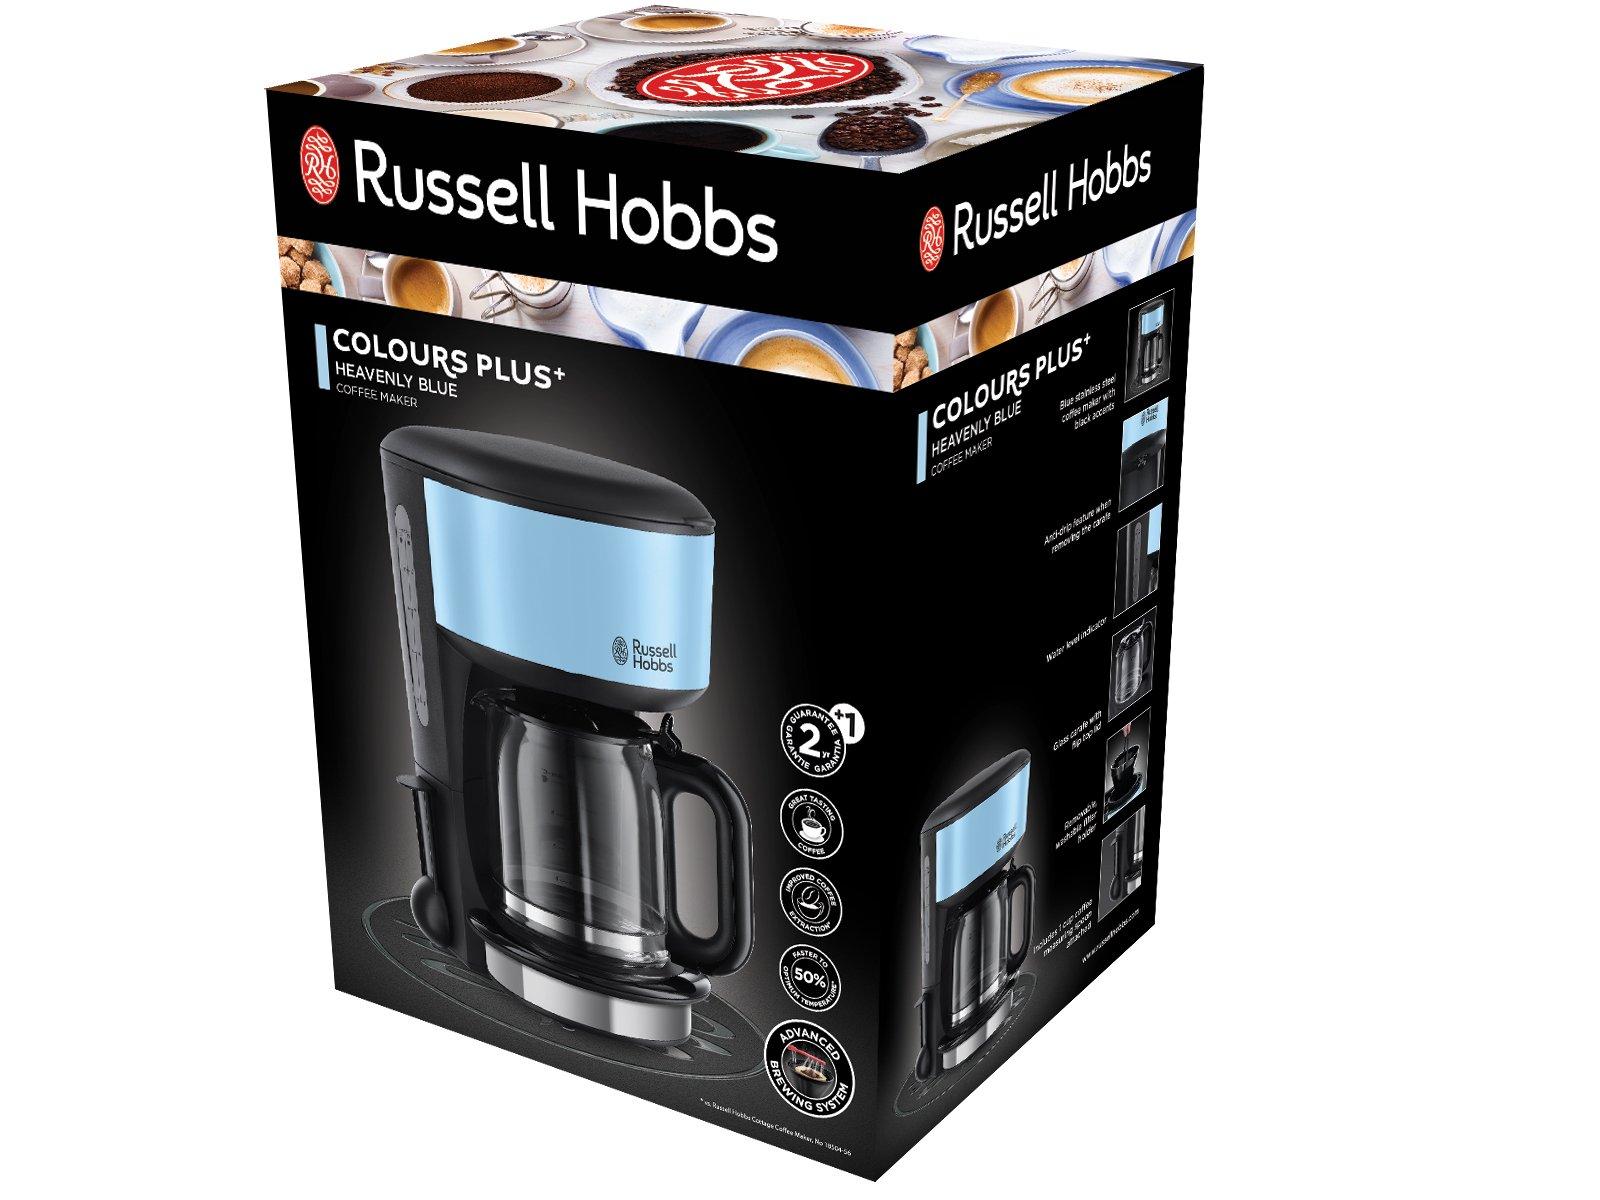 Russell-Hobbs-20136-56-Glas-Kaffeemaschine-Colours-Plus-Heavenly-Blue-125l-Brausekopf-Technologie-Glaskanne-1000-Watt-20136-56-schwarzblau